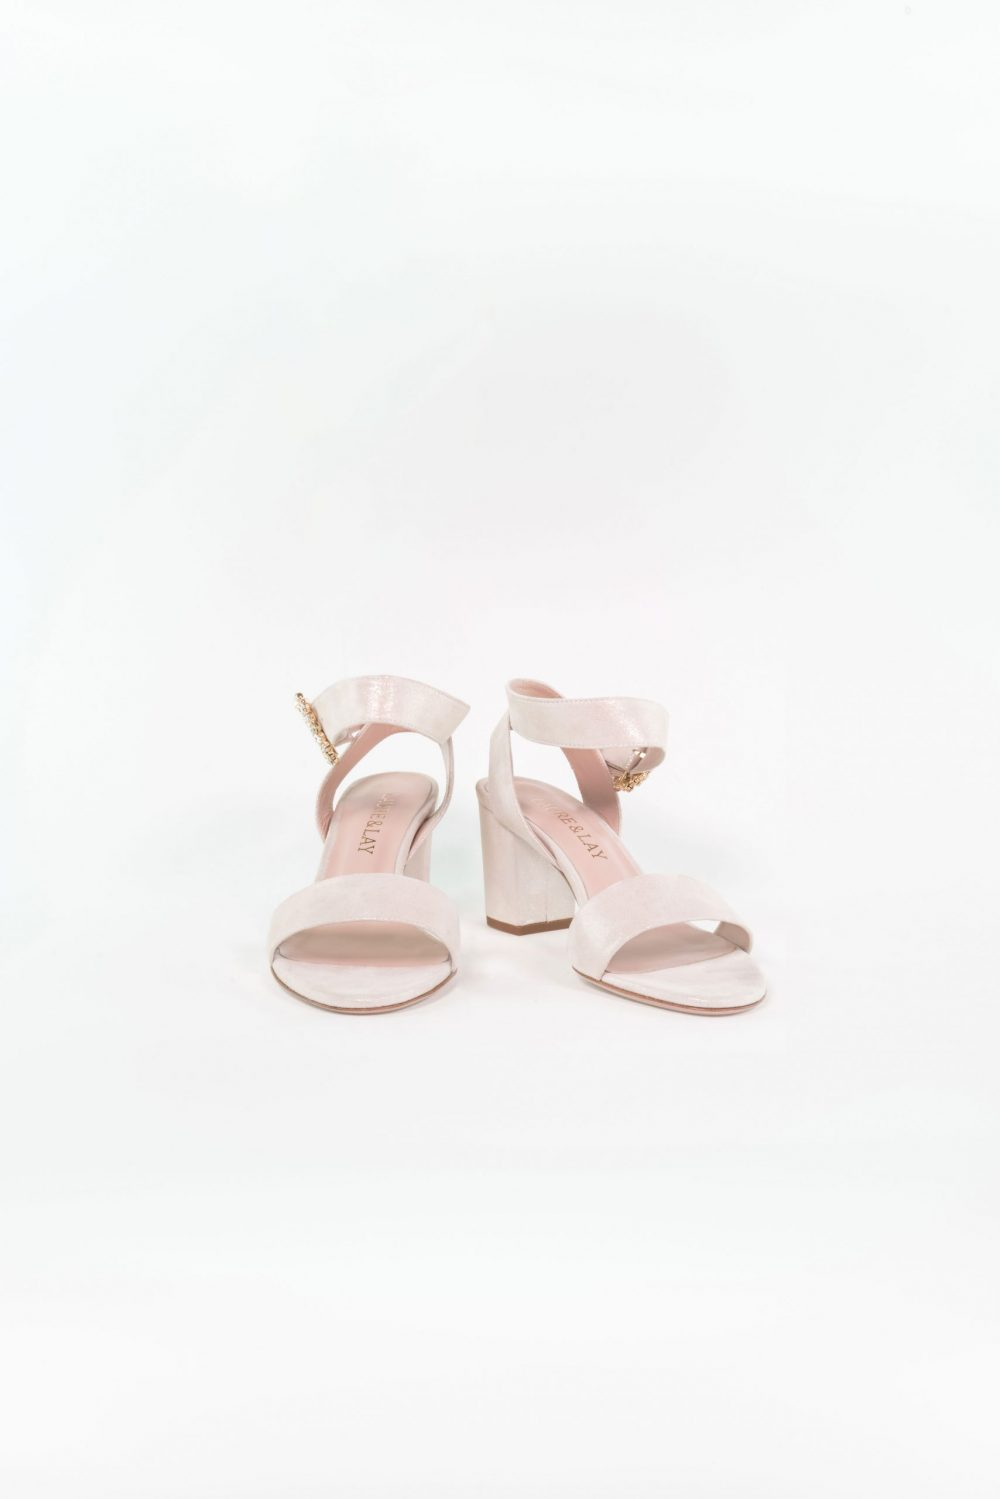 Leder Brautschuh Clara champagne Ankle Strap